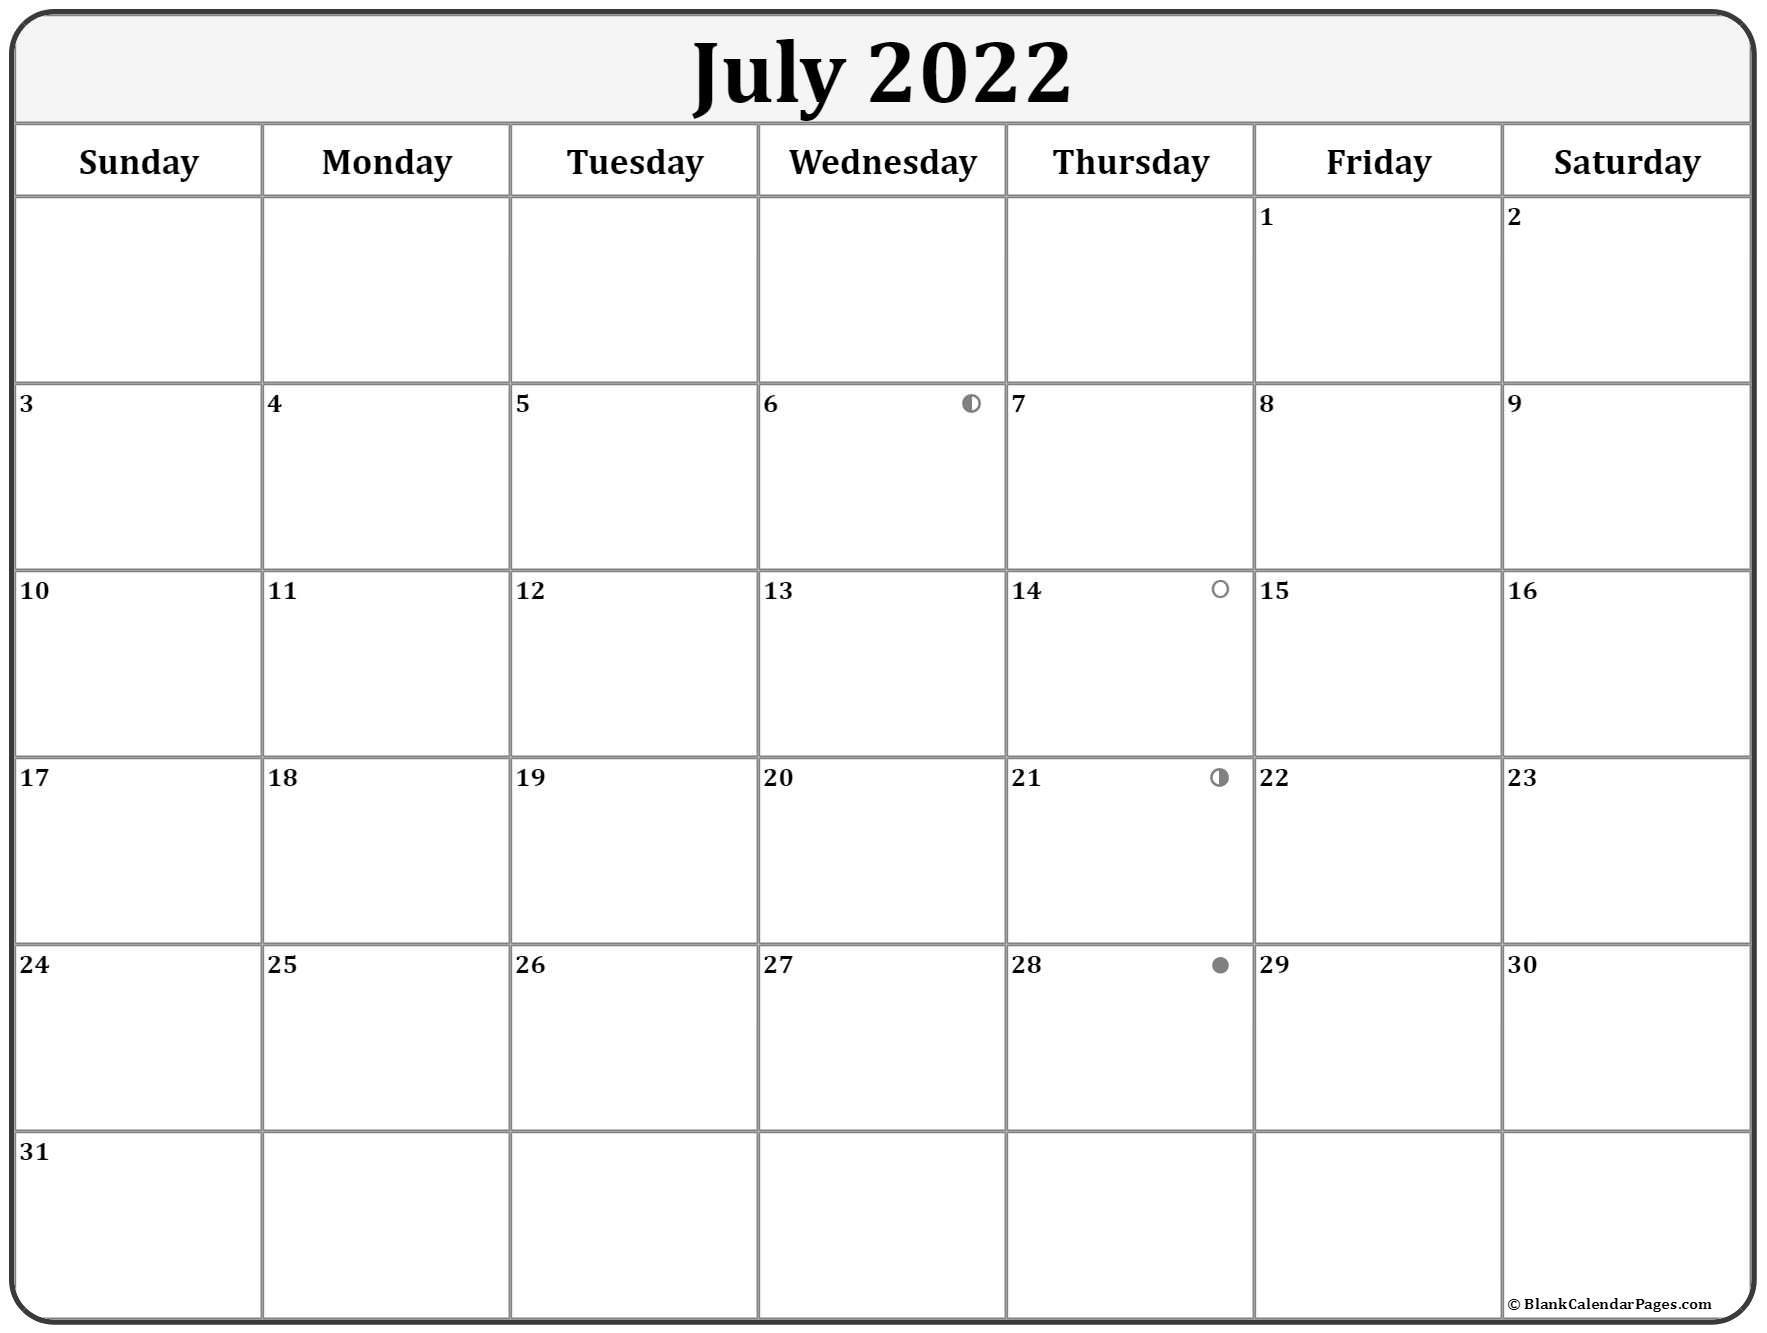 February 2021 Full Moon Phases Calendar - Calendar 2020 July 2021 Lunar Calendar